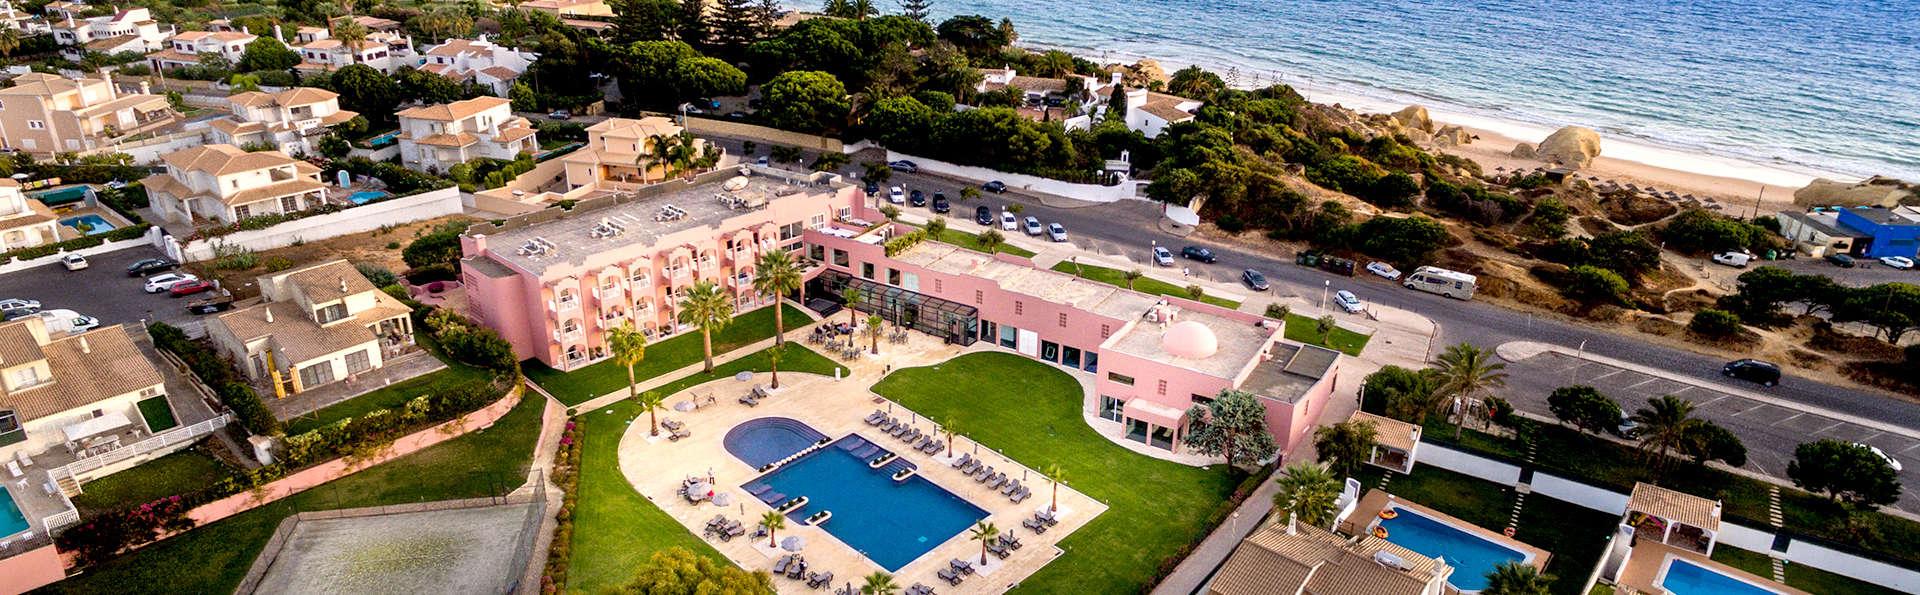 Hotel Vila Galé Praia (Adults Only) - EDIT_NEW_VIEW.jpg